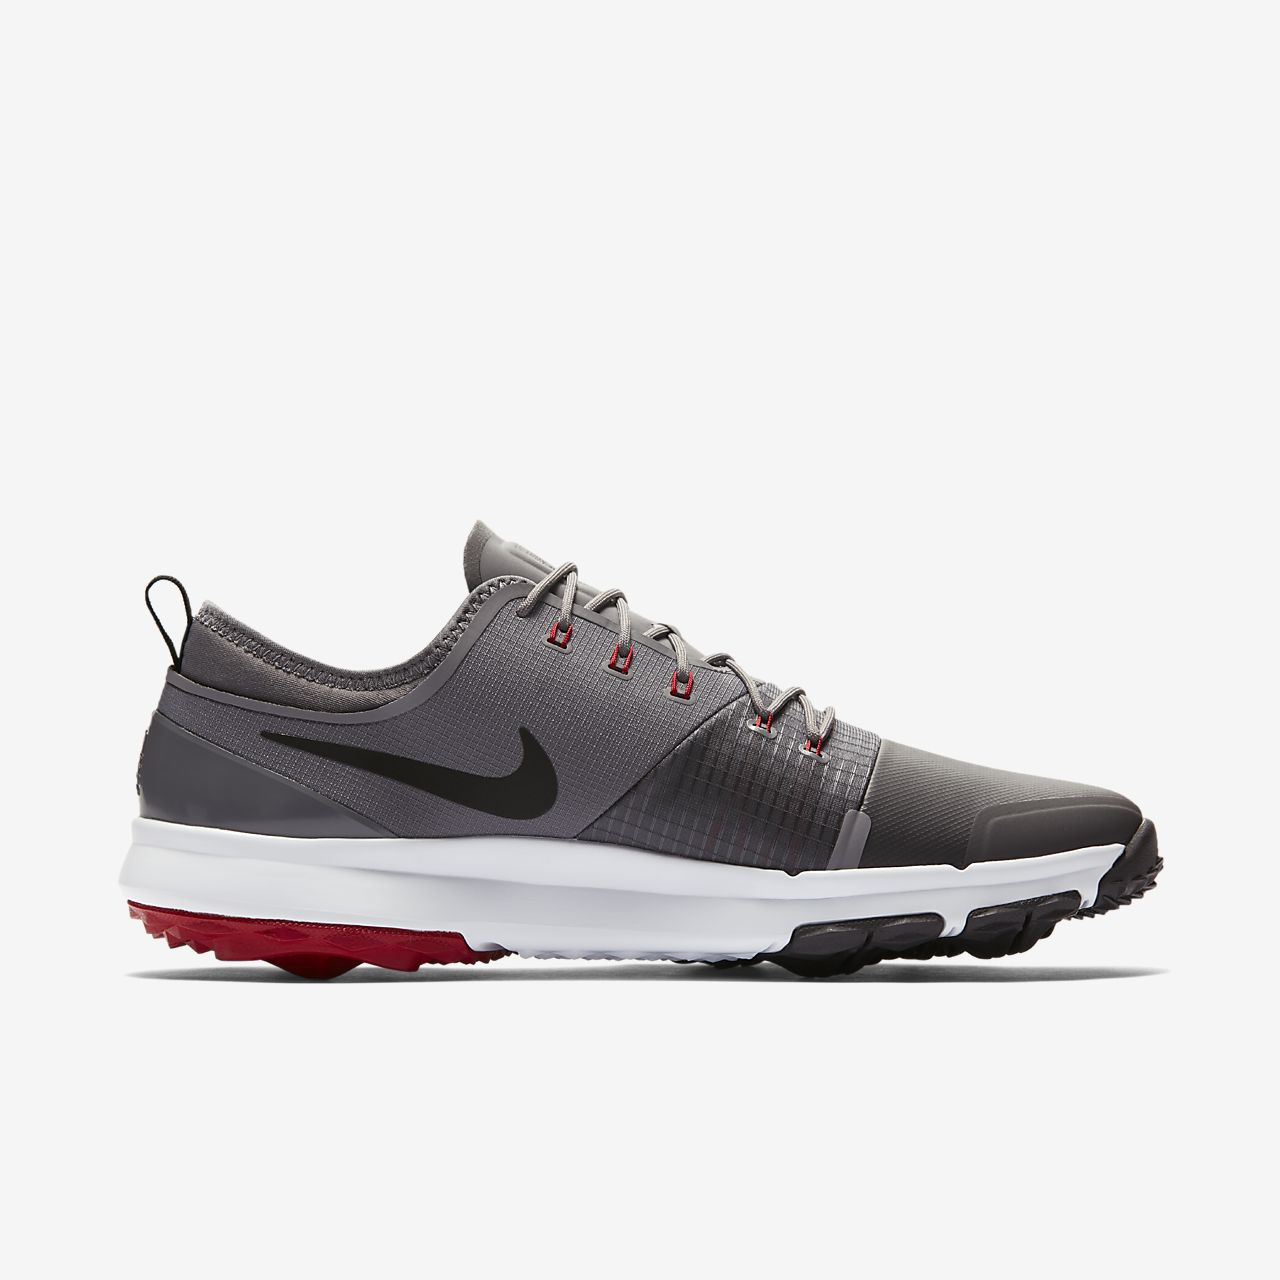 046e25c3a488 Nike FI Impact 3 Men s Golf Shoe. Nike.com GB